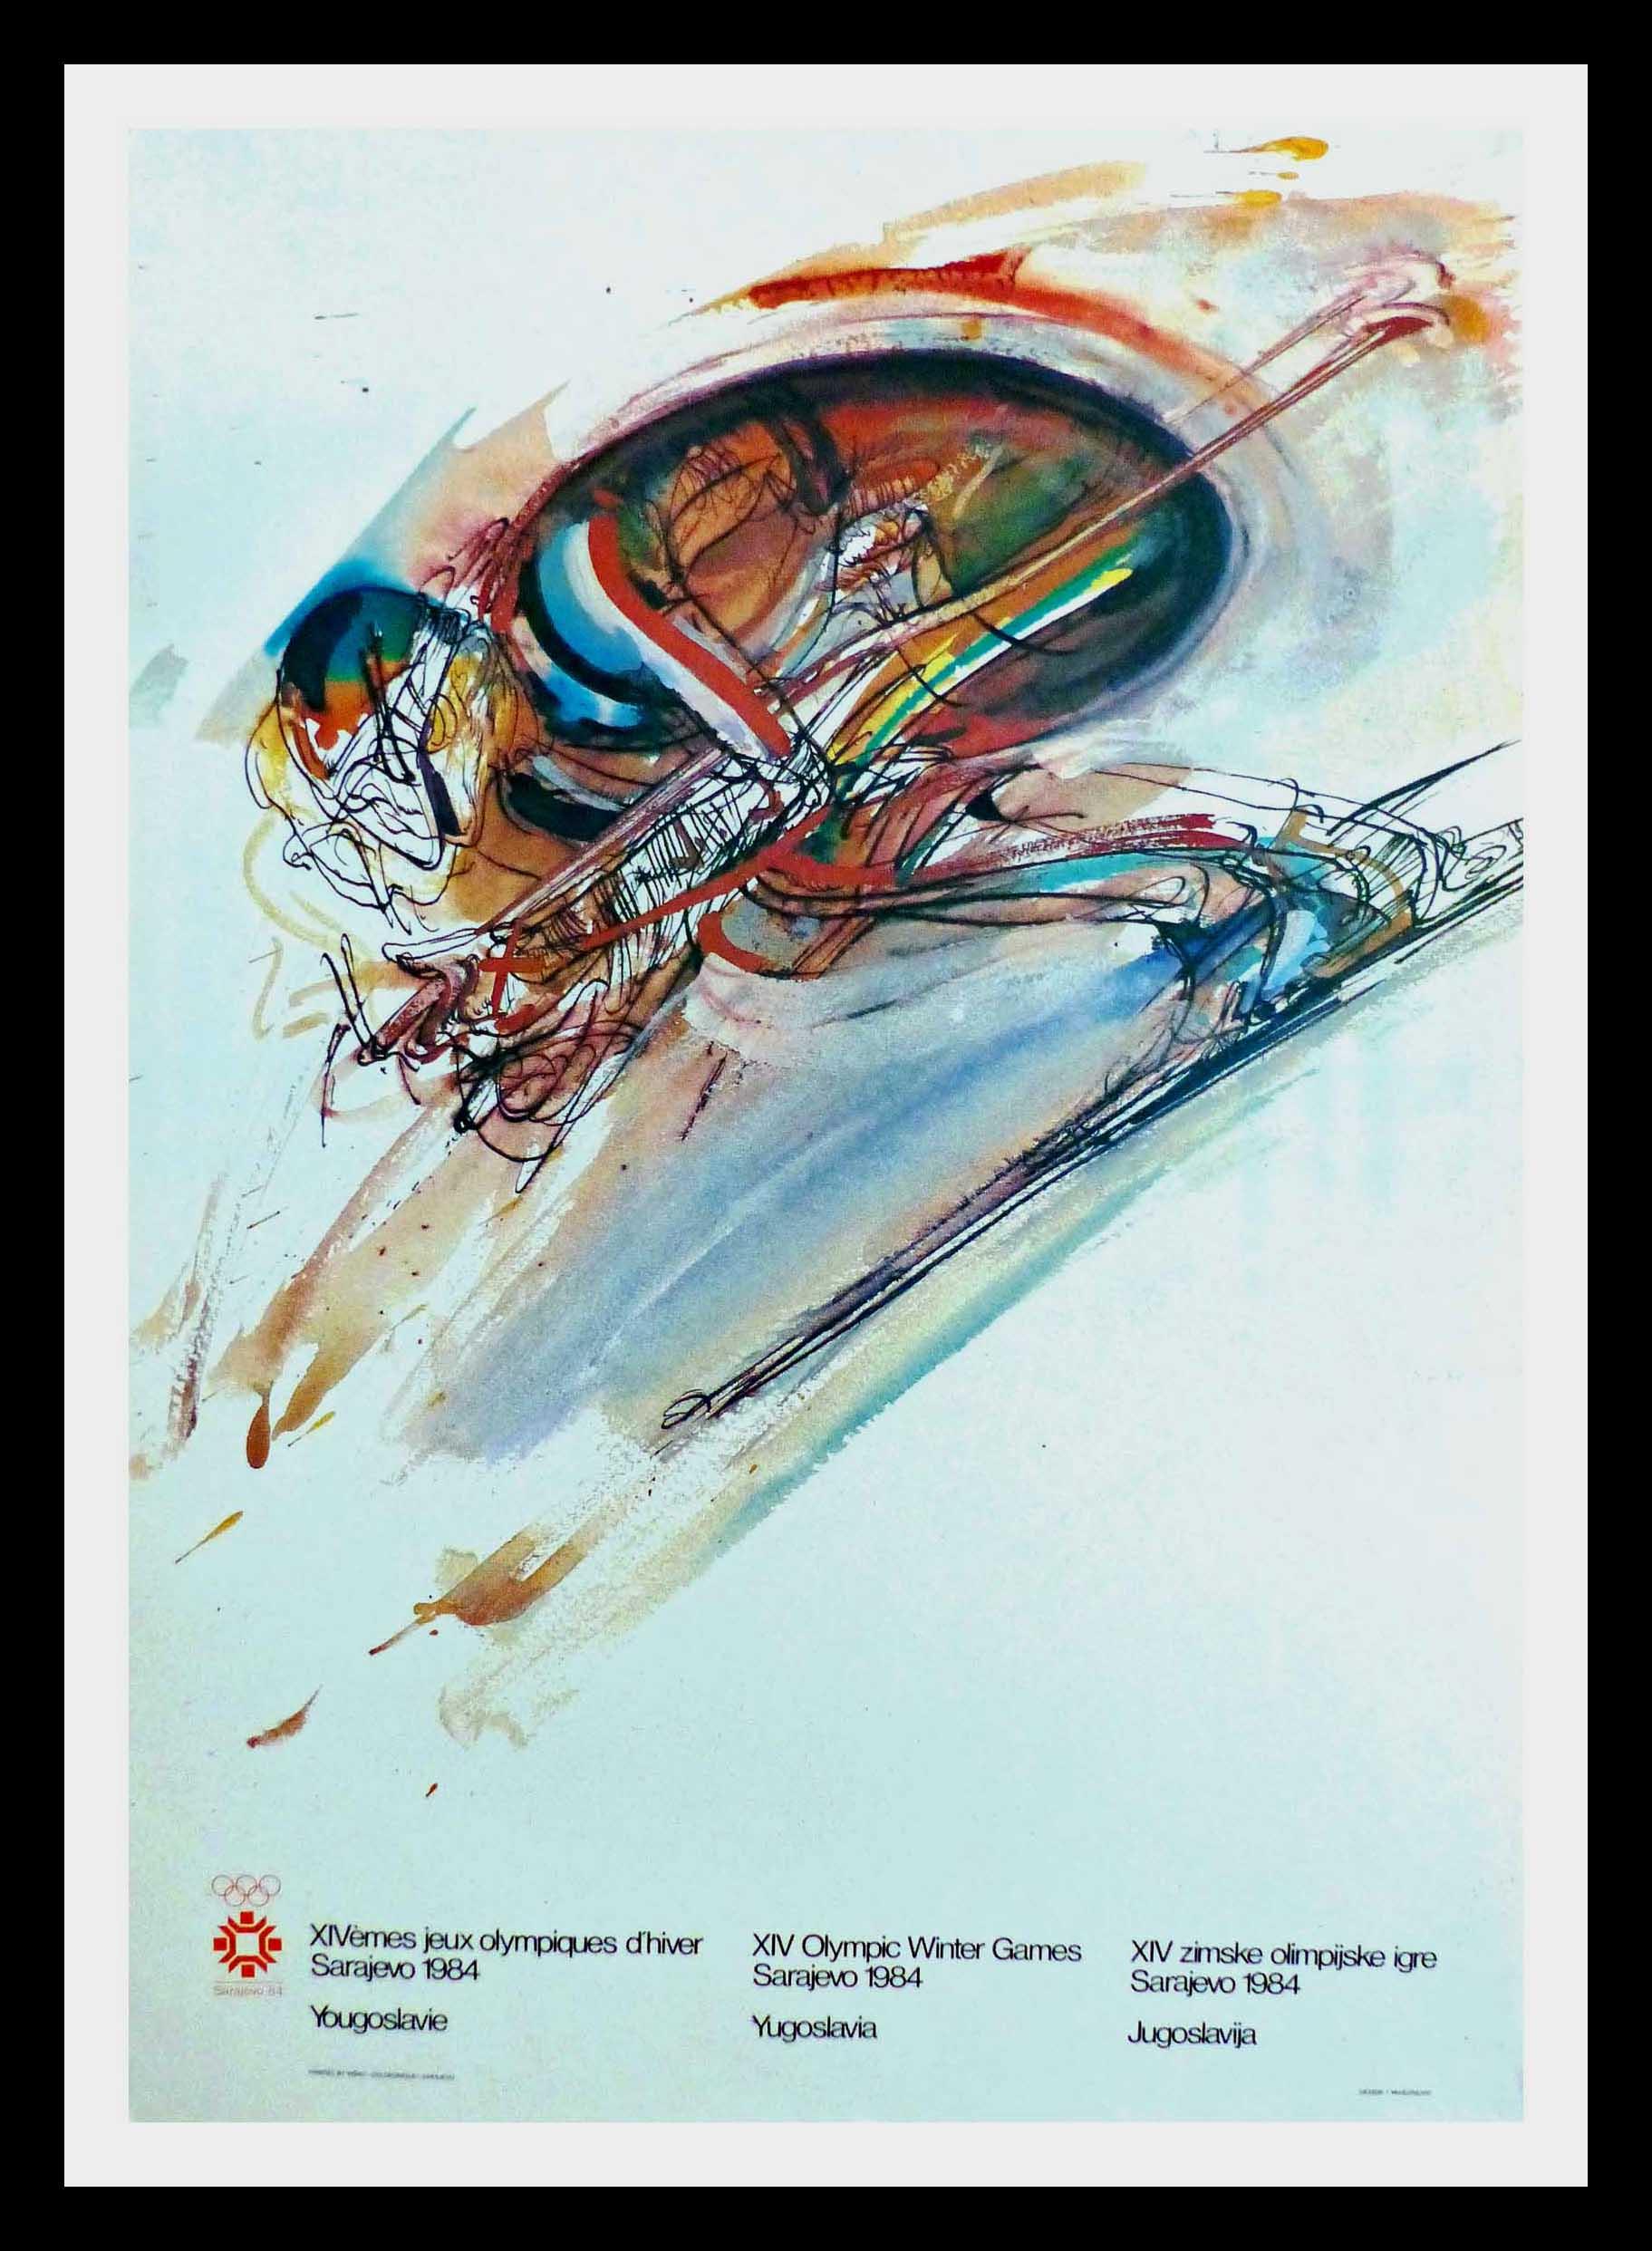 "(alt=""original vintage poster XIV Olympic Winter Games skiing descent Sarajevo Yugoslavia 1984"")"